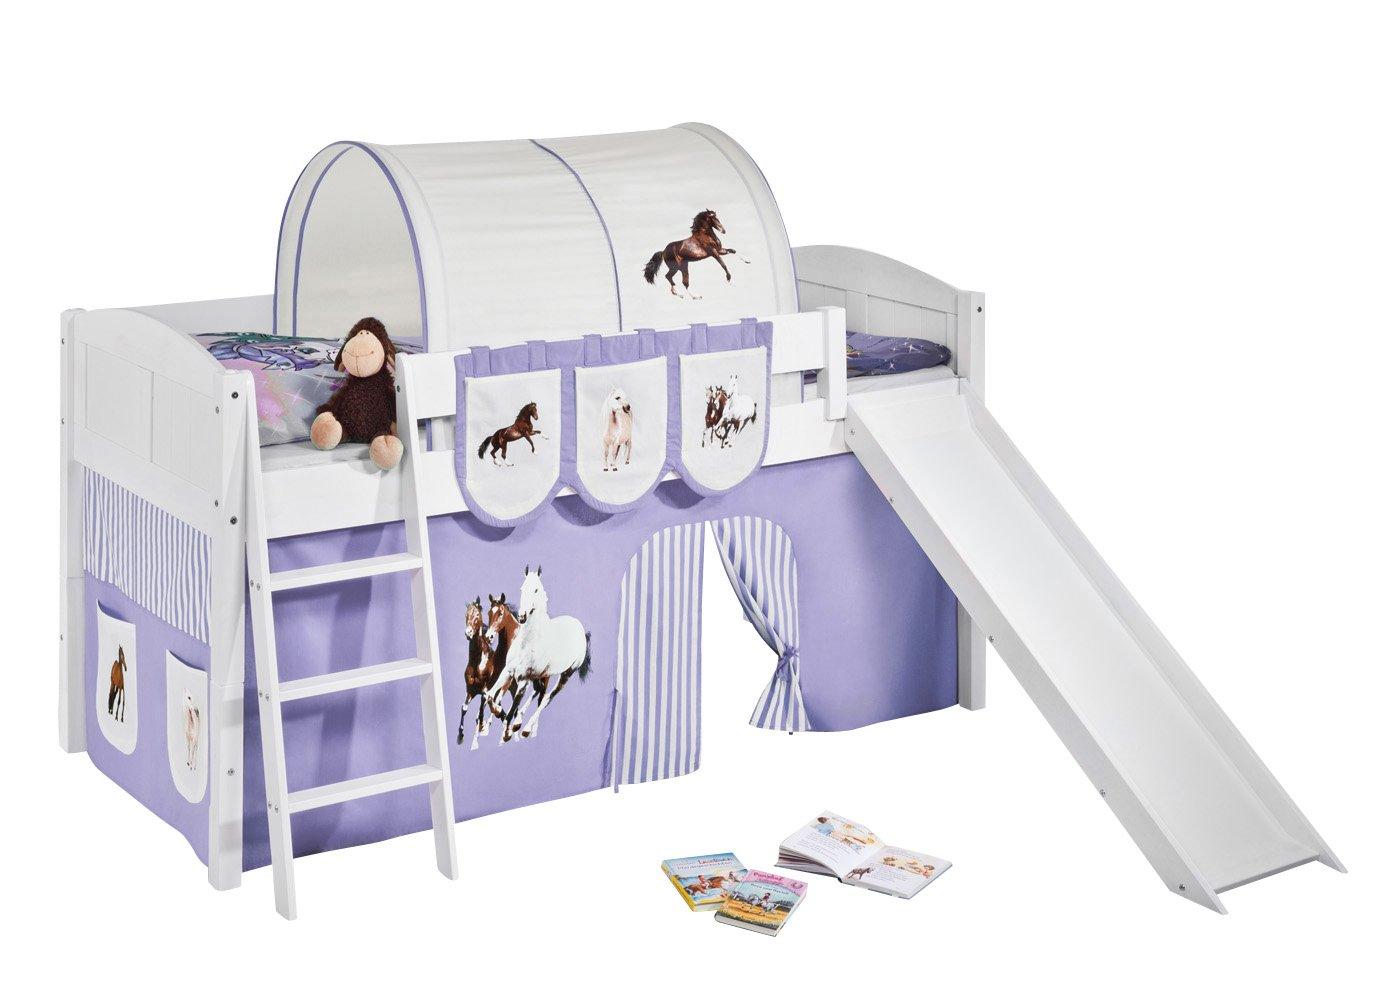 Lilokids IDA4106KWR-PFERDE-LILA Kinderbett, Holz, pferd lila, 208 x 220 x 113 cm